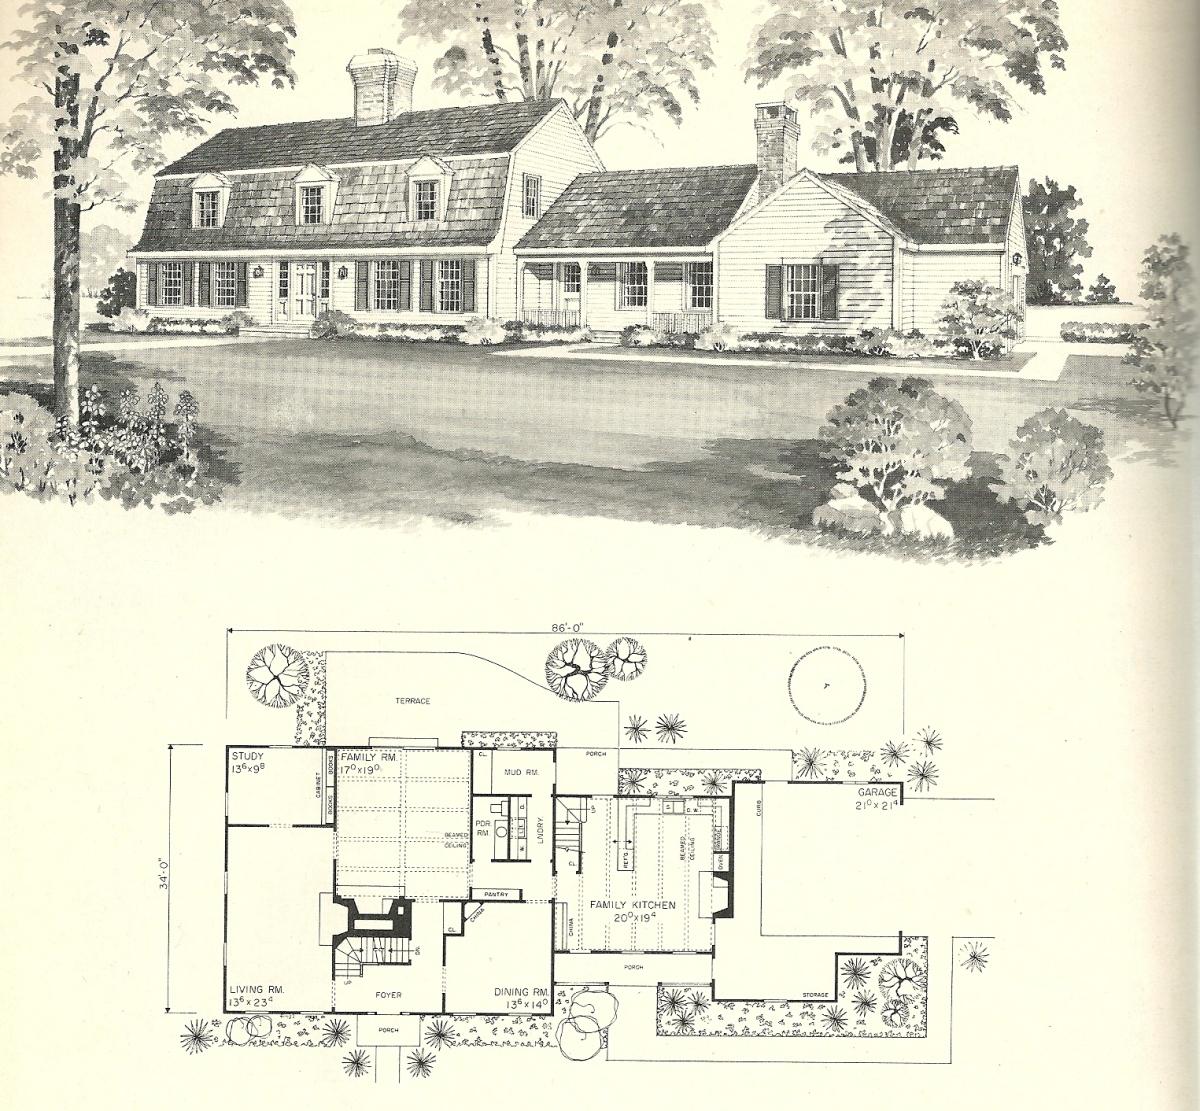 Superb Gambrel Roof House Plans Nice Ideas Agemslife Com Largest Home Design Picture Inspirations Pitcheantrous